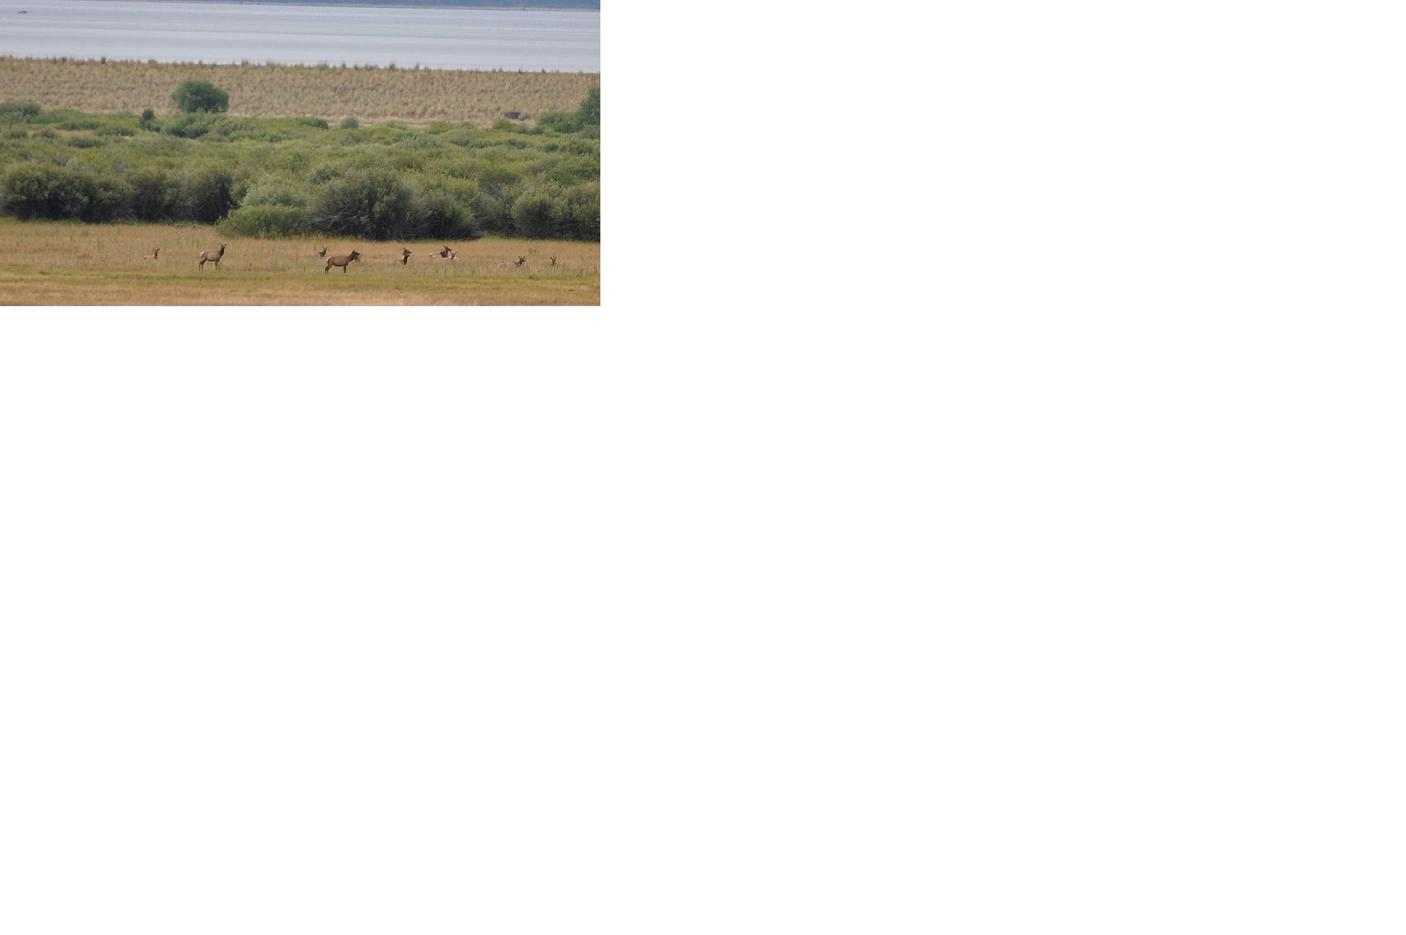 Click image for larger version  Name:elk.JPG Views:151 Size:45.3 KB ID:1864